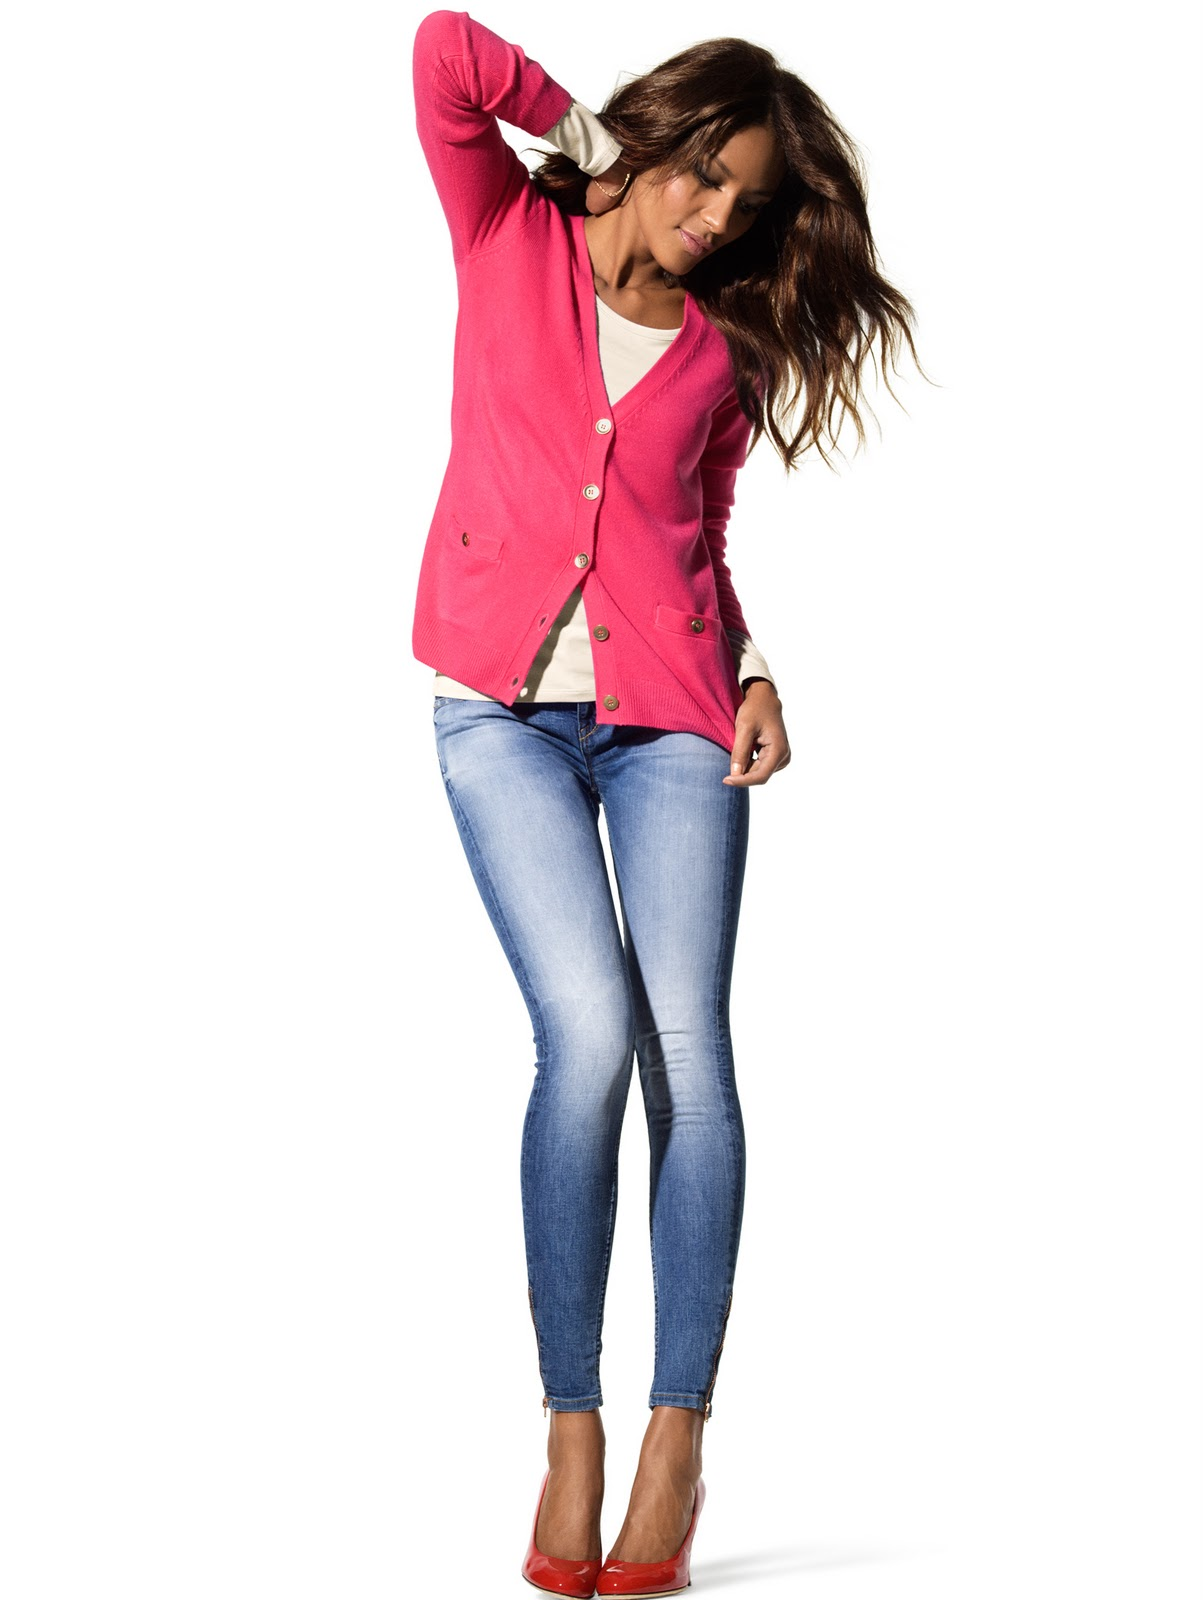 http://3.bp.blogspot.com/_kDujDzwdR0M/TTaJHNpFnPI/AAAAAAAAFLM/2fUh1sY60P4/s1600/Emanuela+De+Paula+%2528Gina+Tricot+Jan+2011%2529.jpg